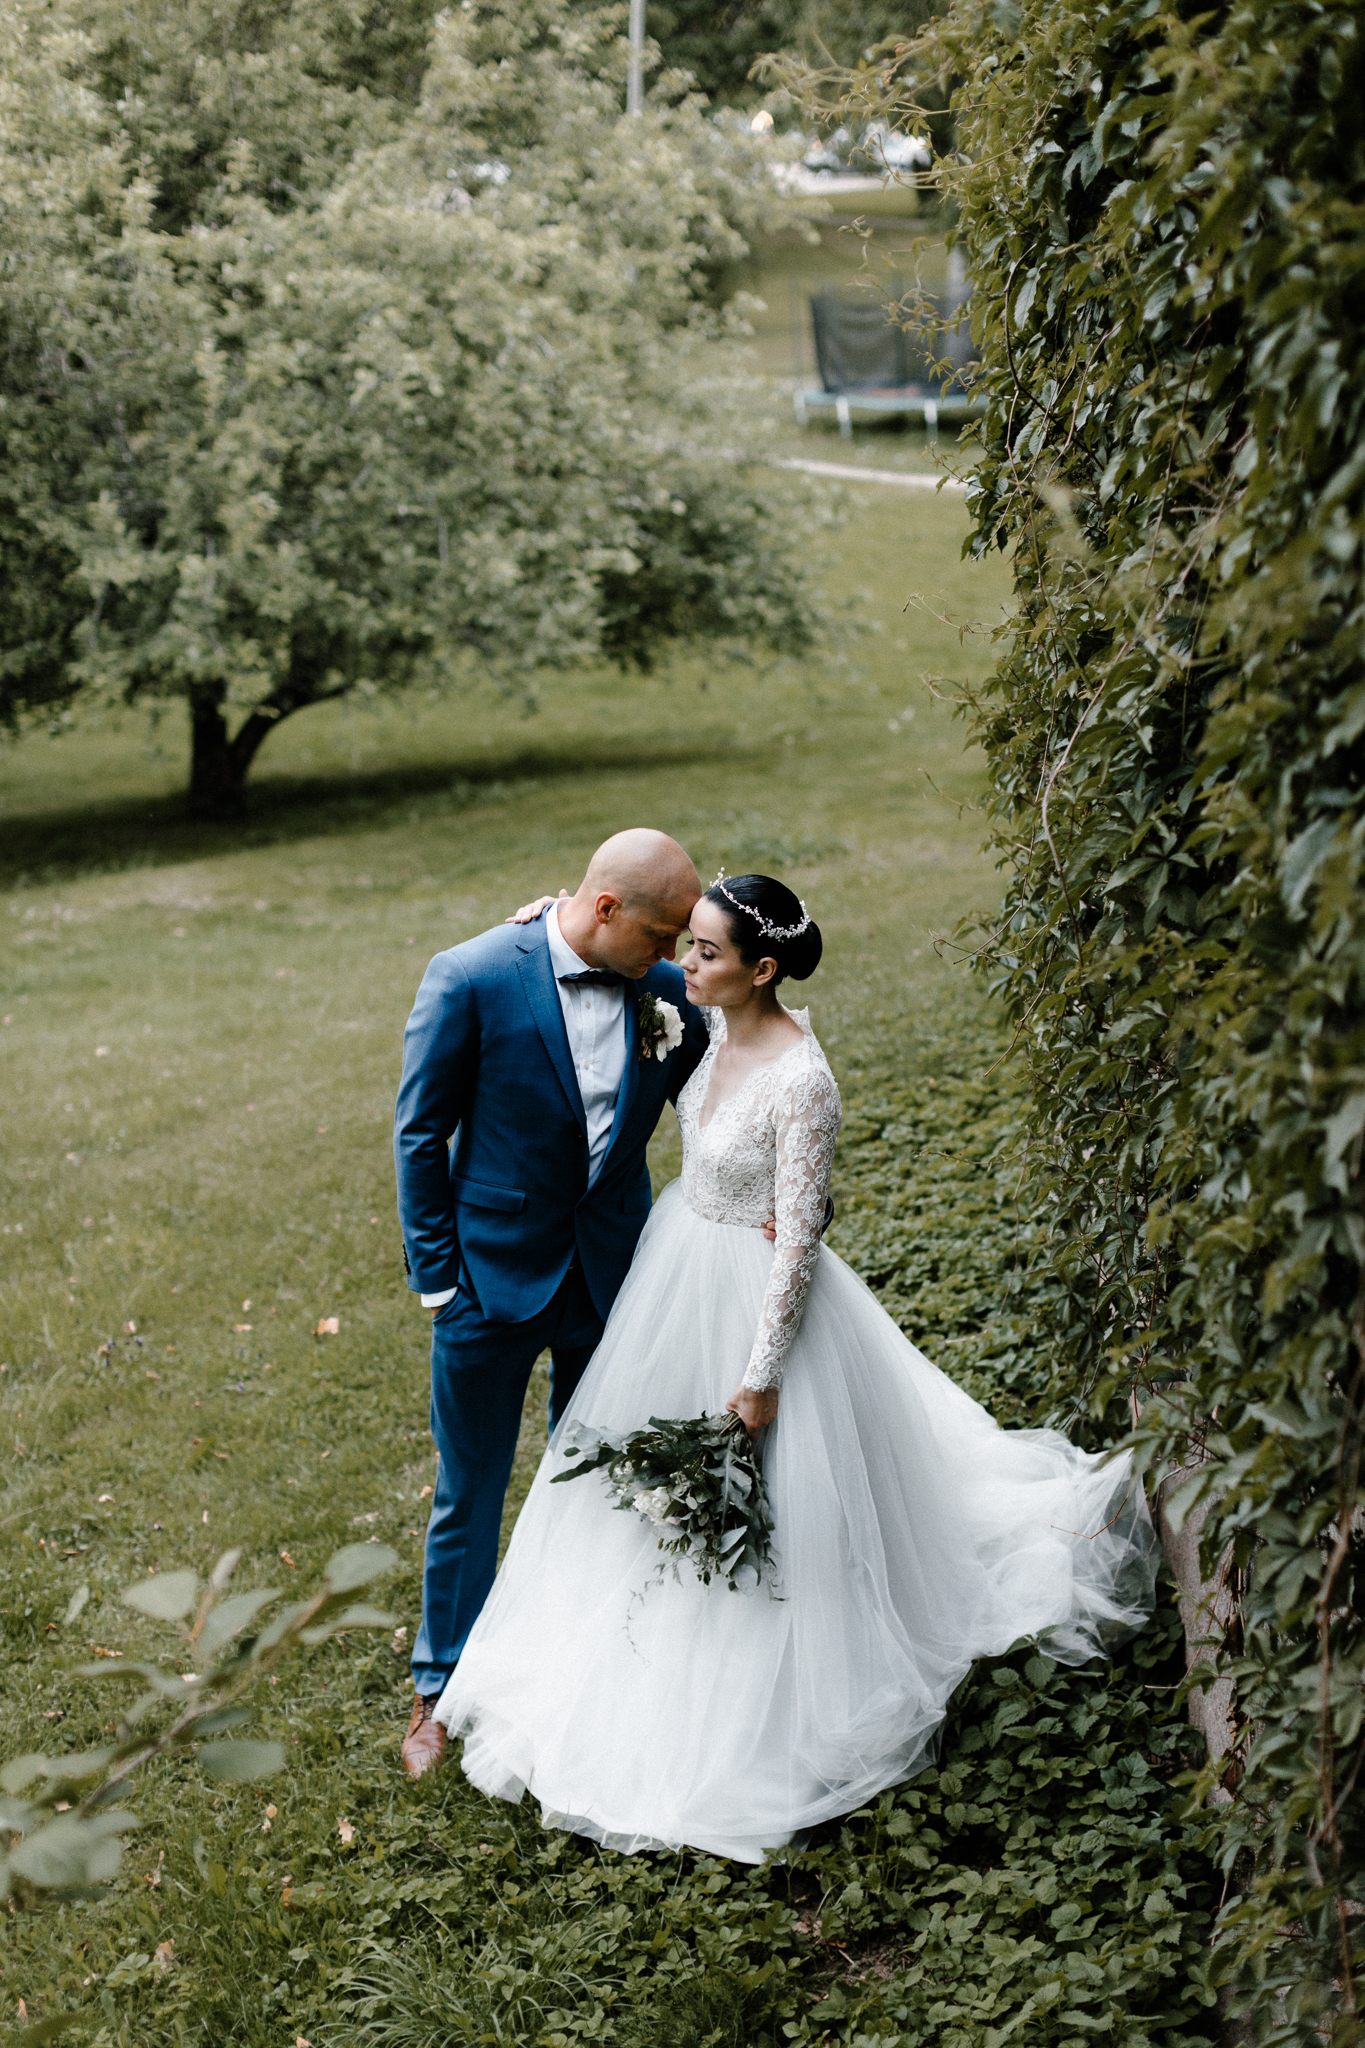 Essi + Ville   Oitbacka Gården   by Patrick Karkkolainen Wedding Photography-339.jpg